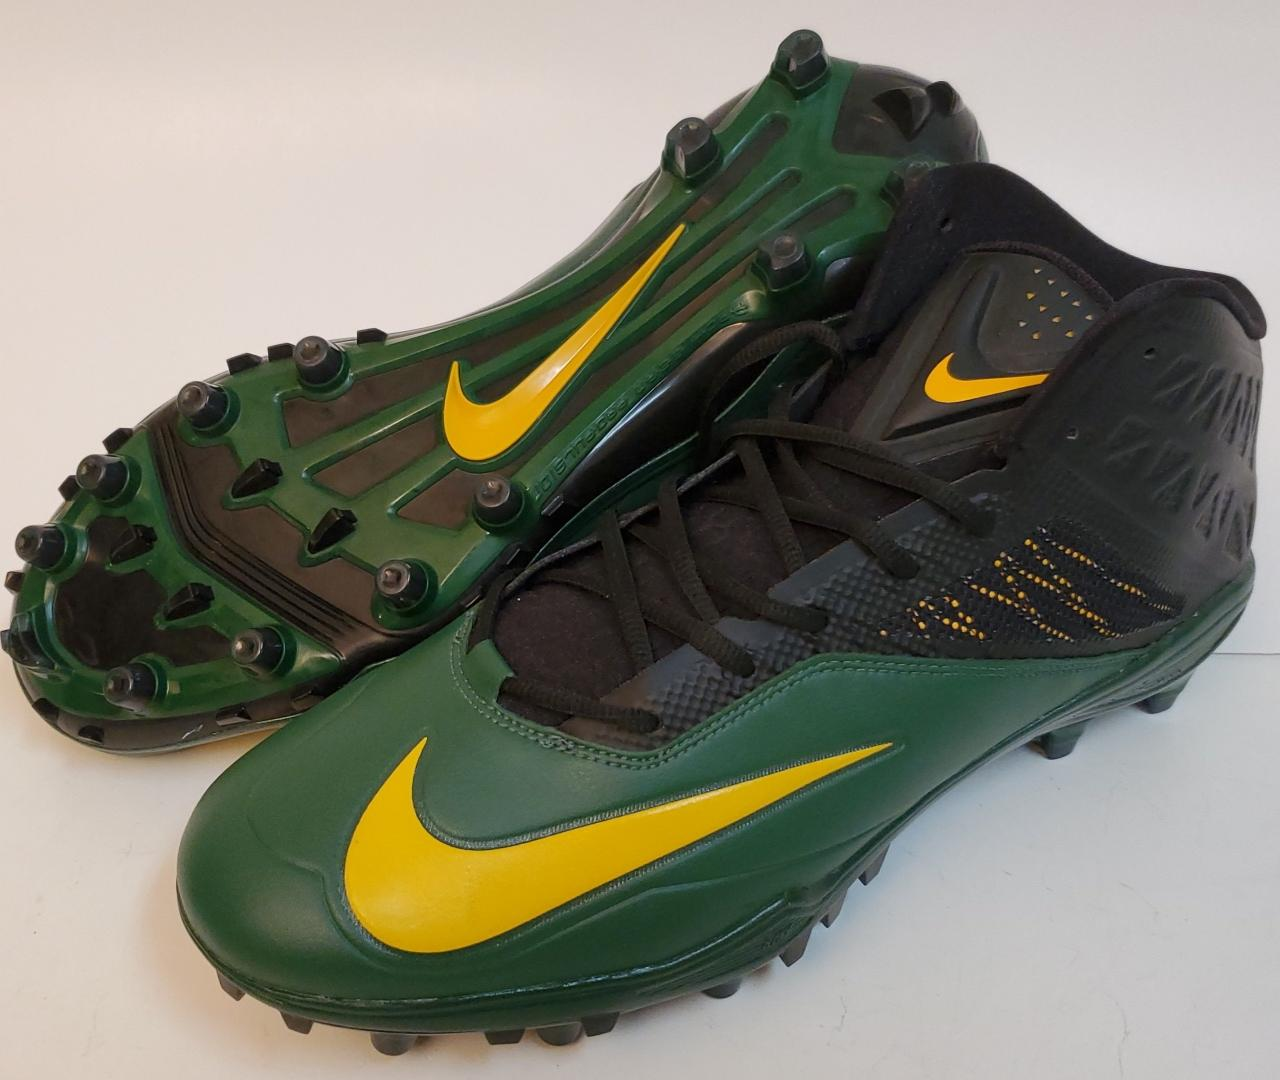 Nike New LN2 Green Yellow Black Molded